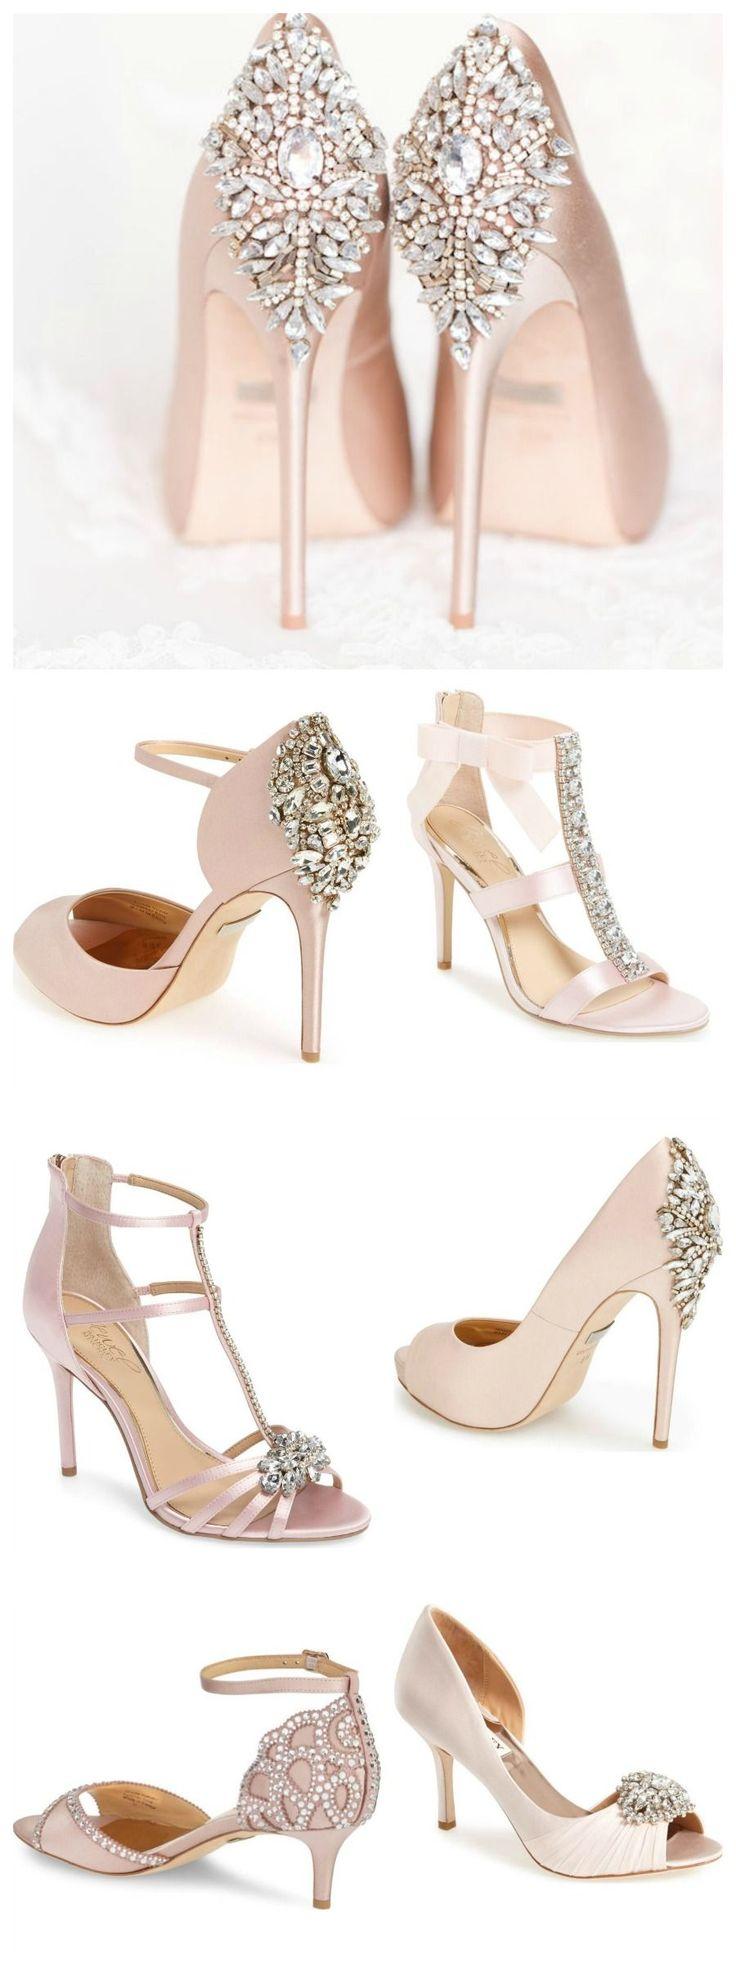 Blush Wedding Shoes (Amy & Jordan Photography)